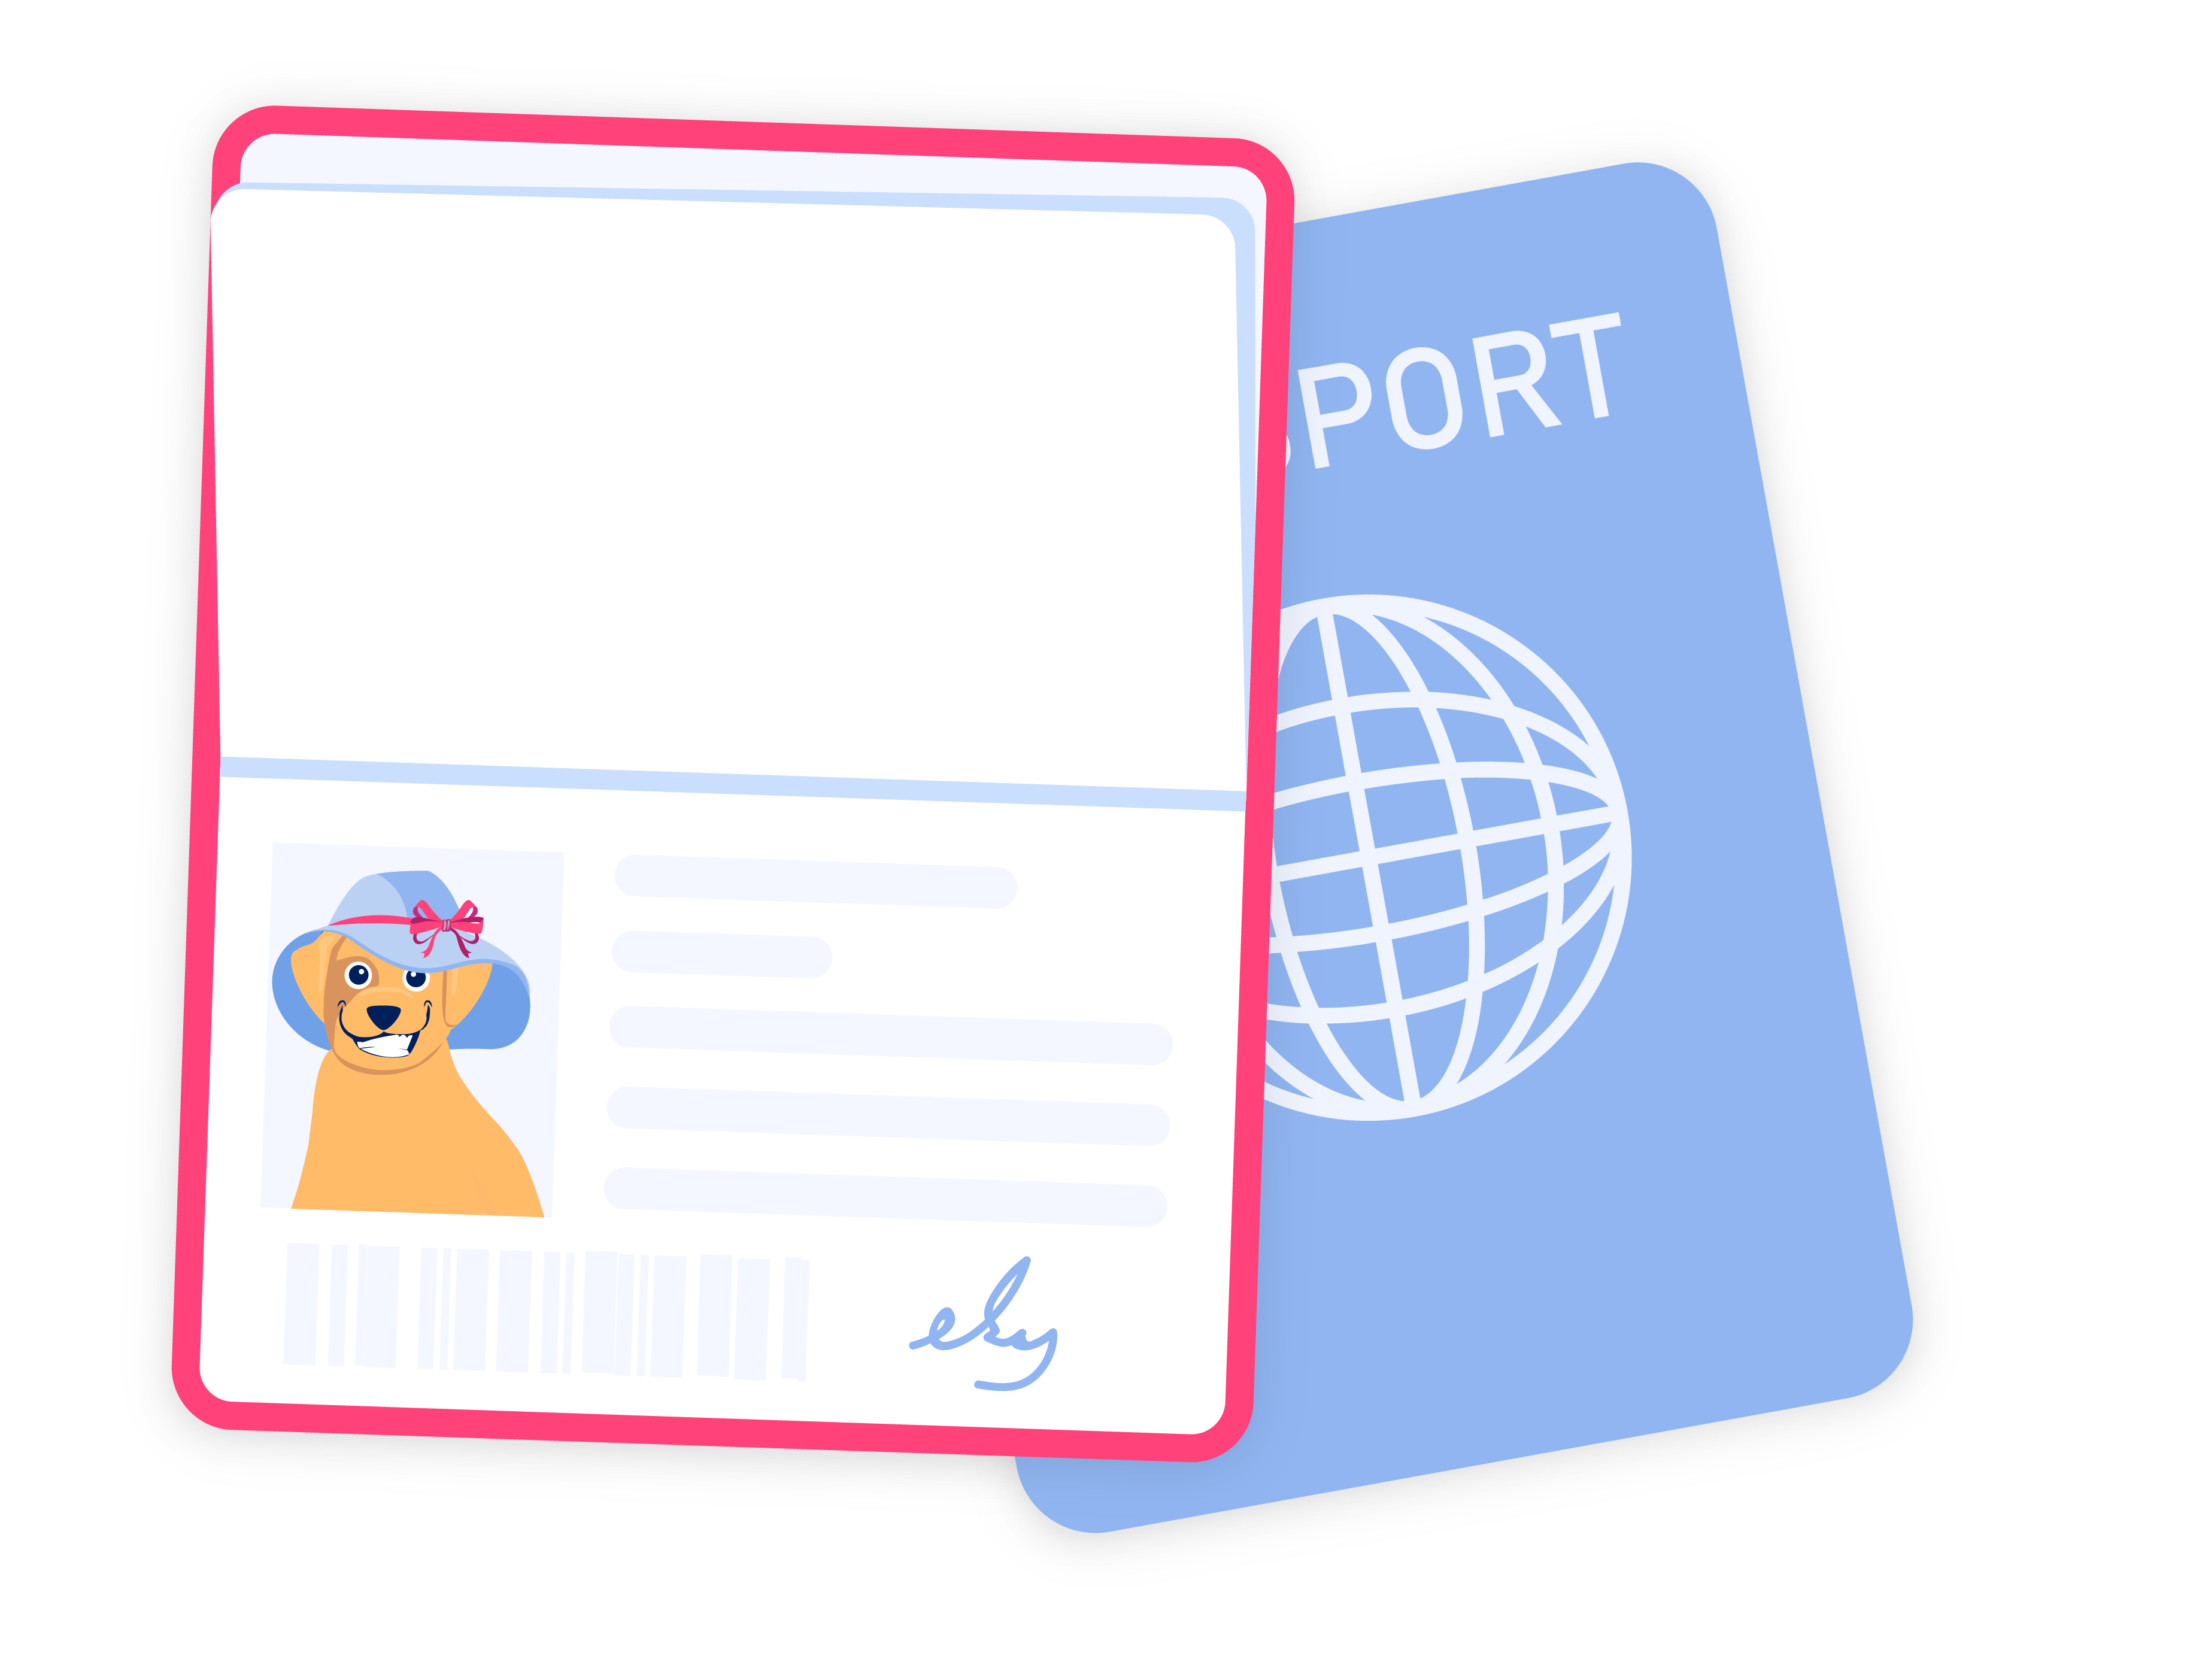 Dog passport illustration.